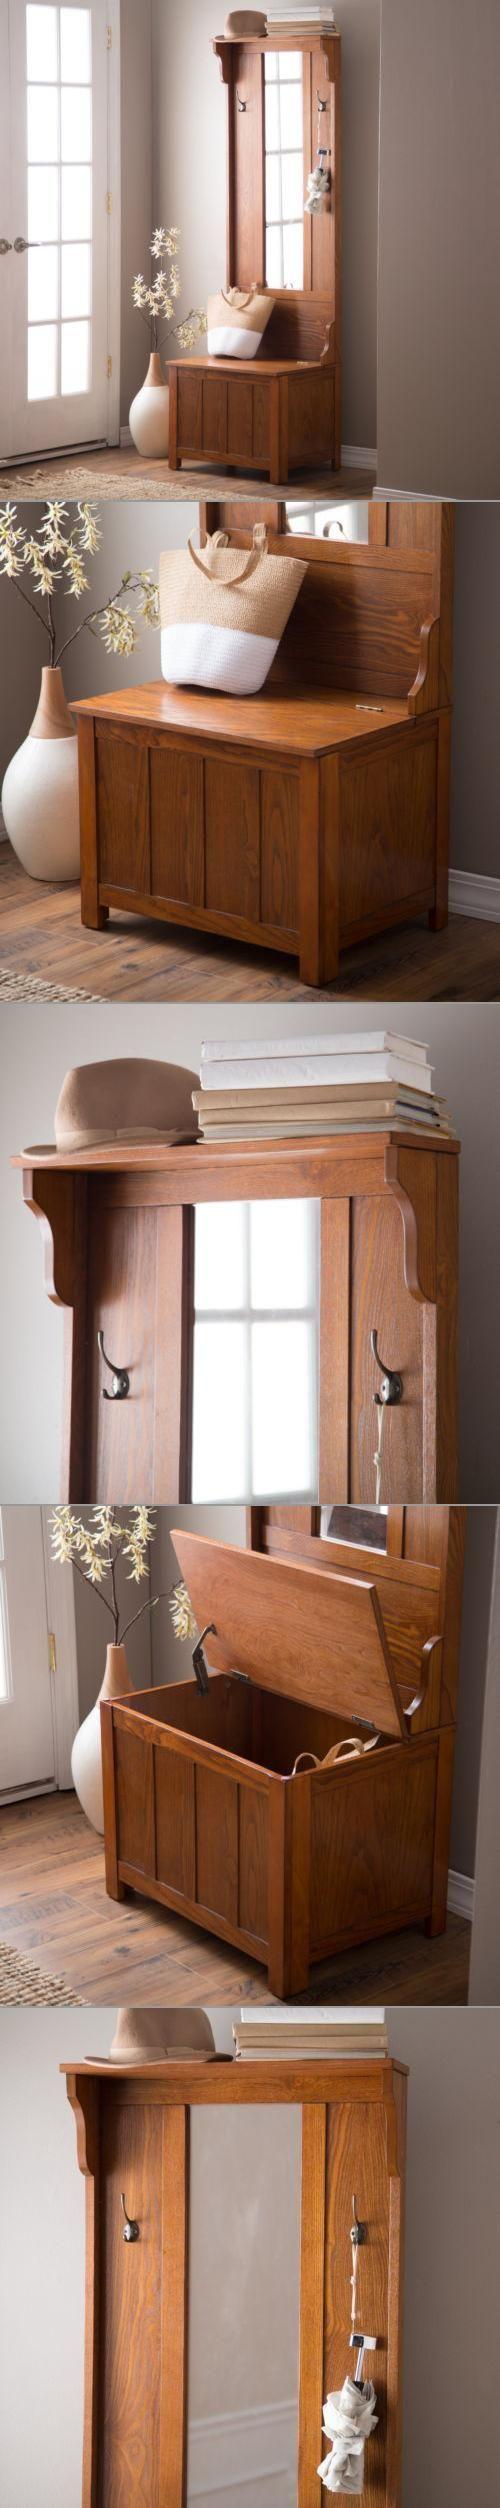 Hallway storage shoes  Slim Tall Hallway Tree Storage Furniture Bench Mirror Coat Rack